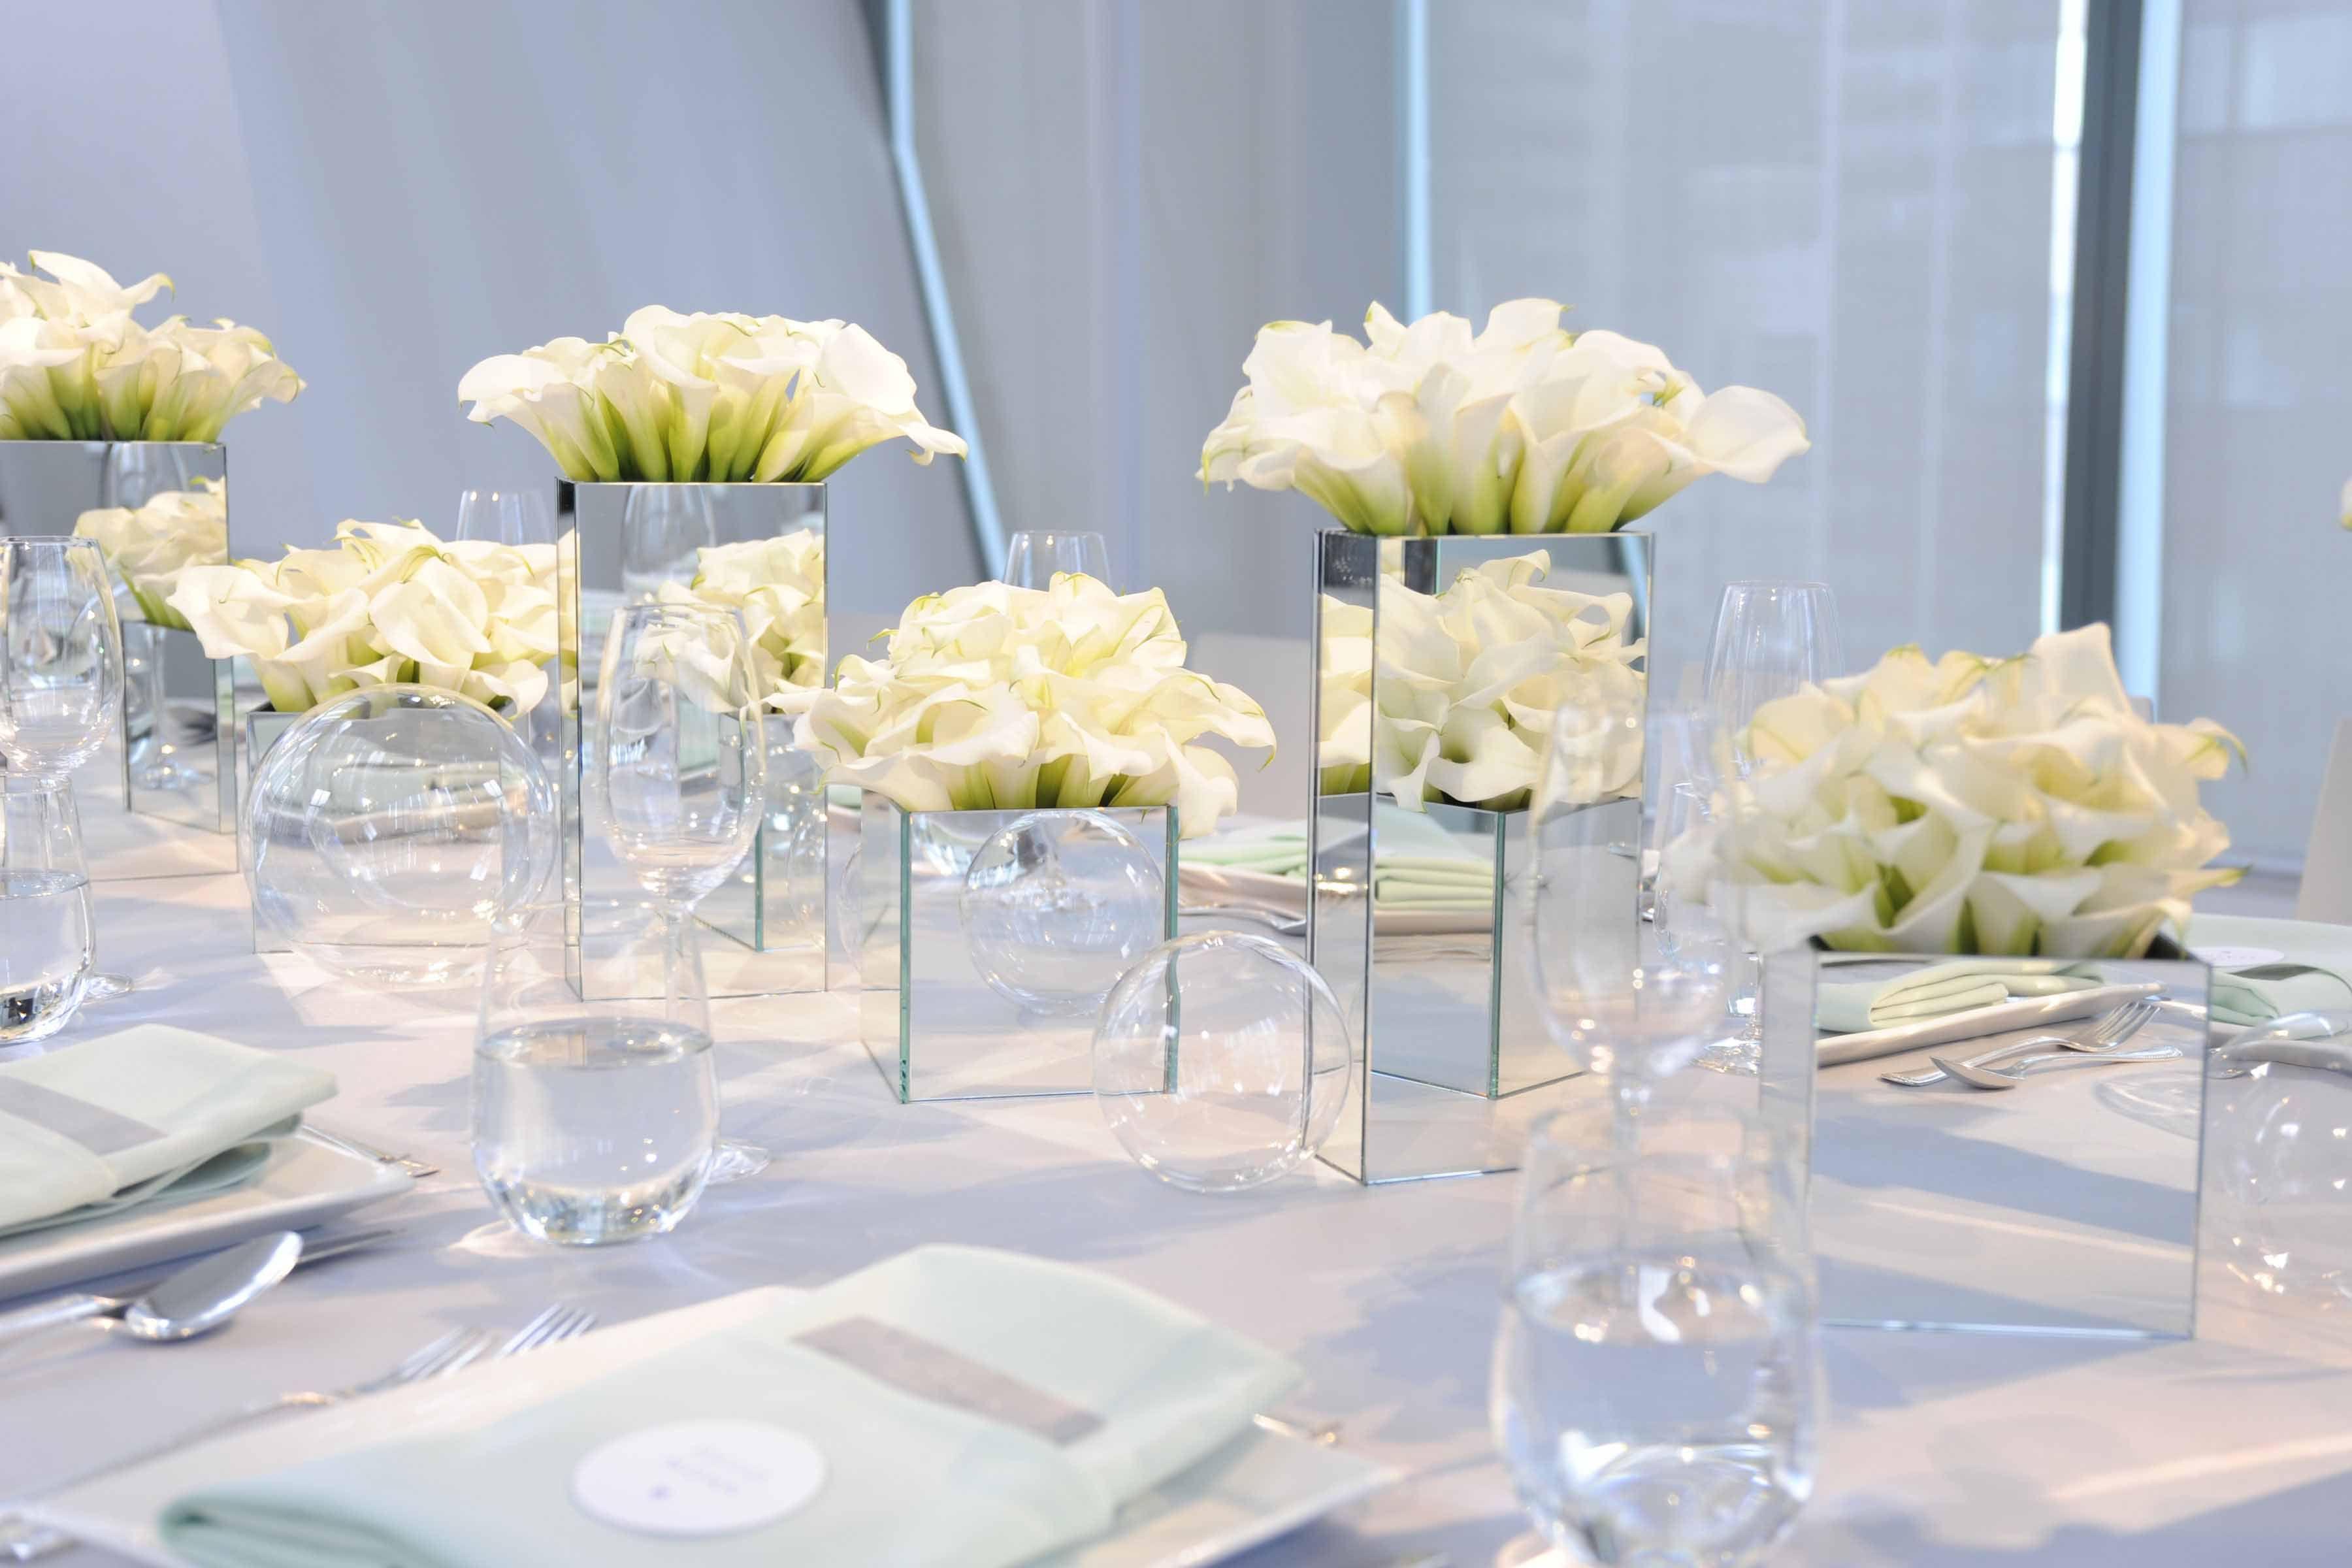 Weddings The Art Of Entertaining Mirror Vase Centerpiece Modern Wedding Decor Mirror Vase